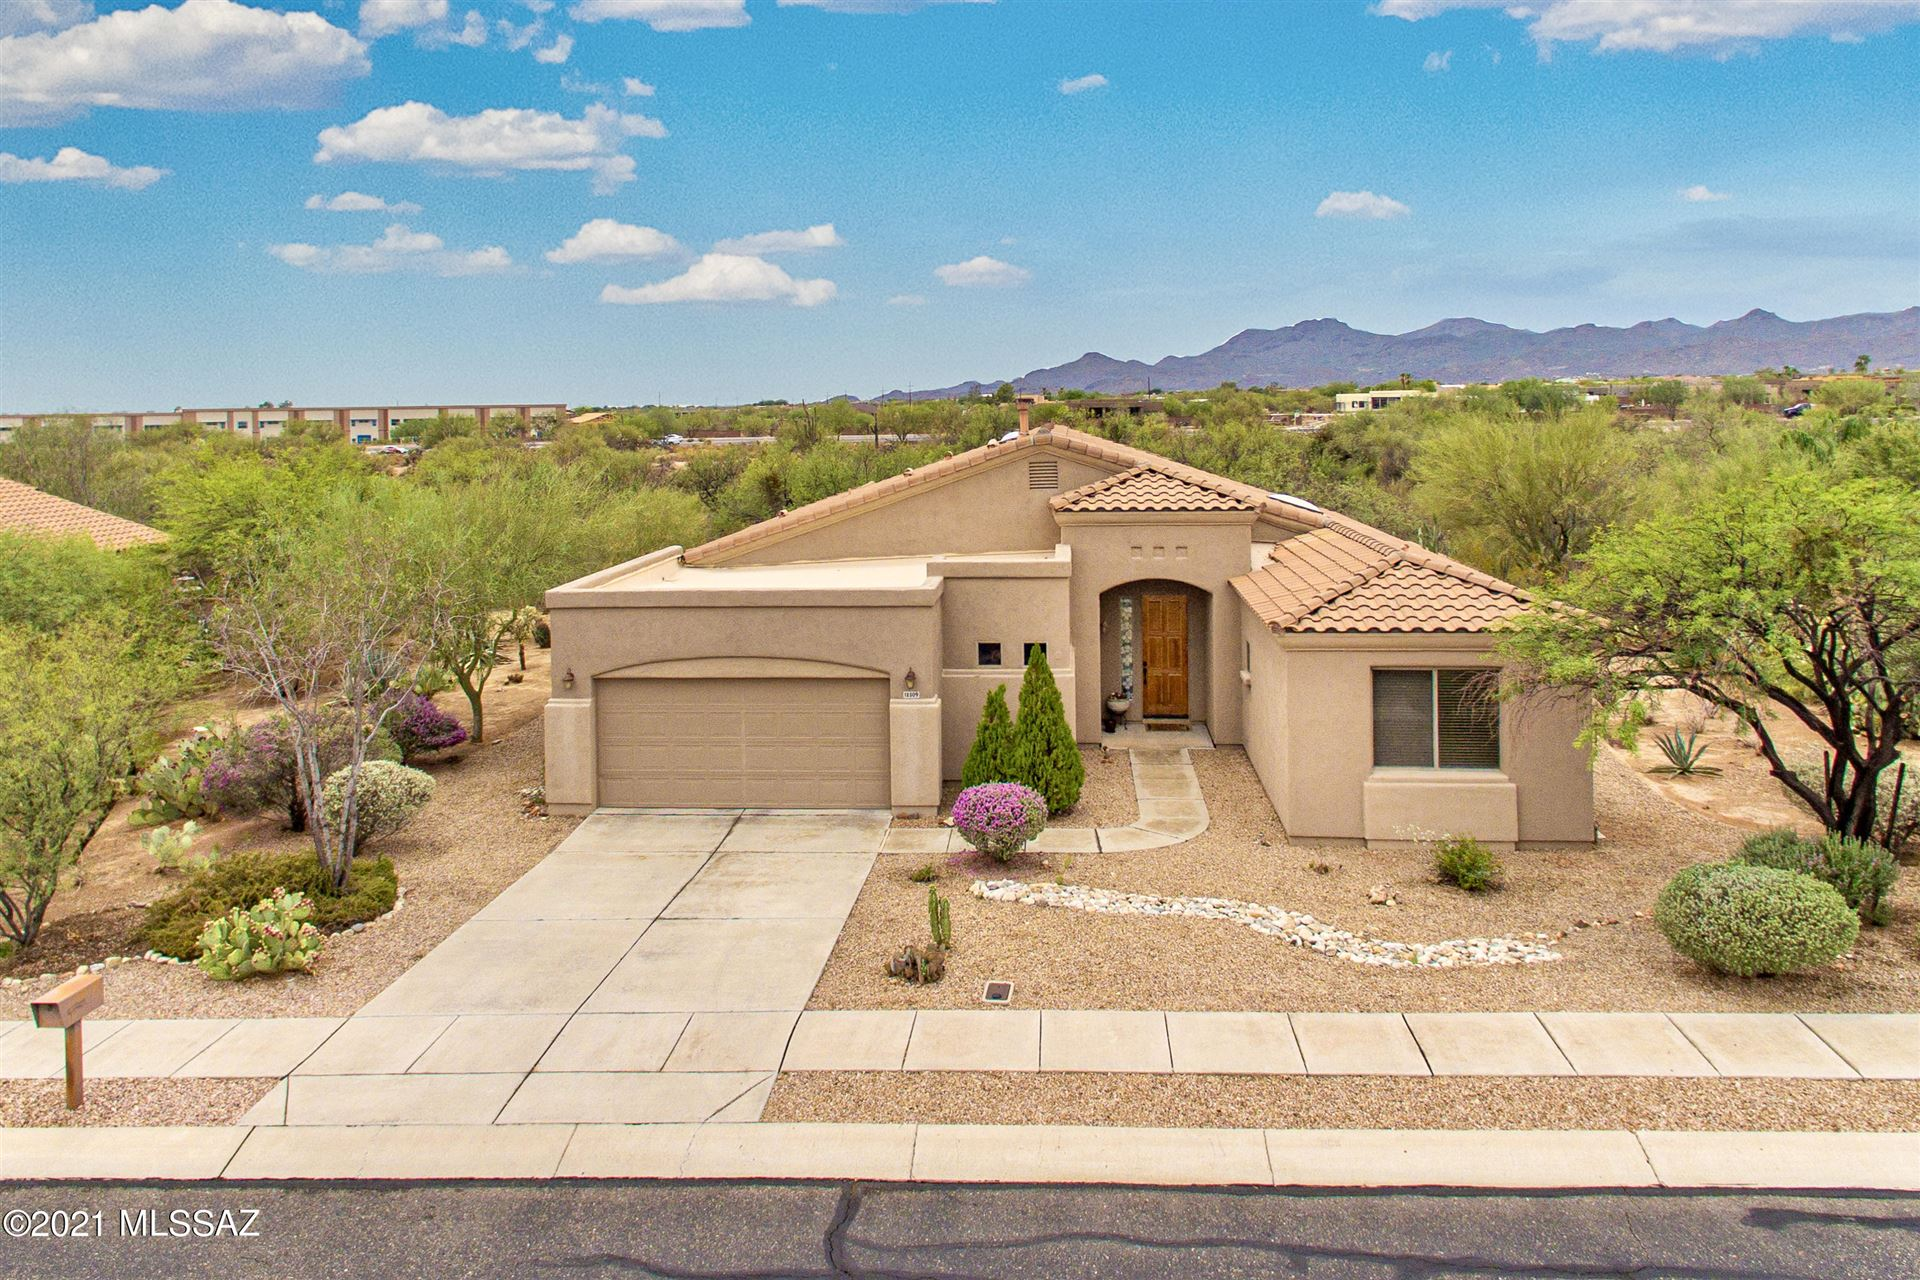 12309 N Washbed Drive, Oro Valley, AZ 85755 - MLS#: 22118343